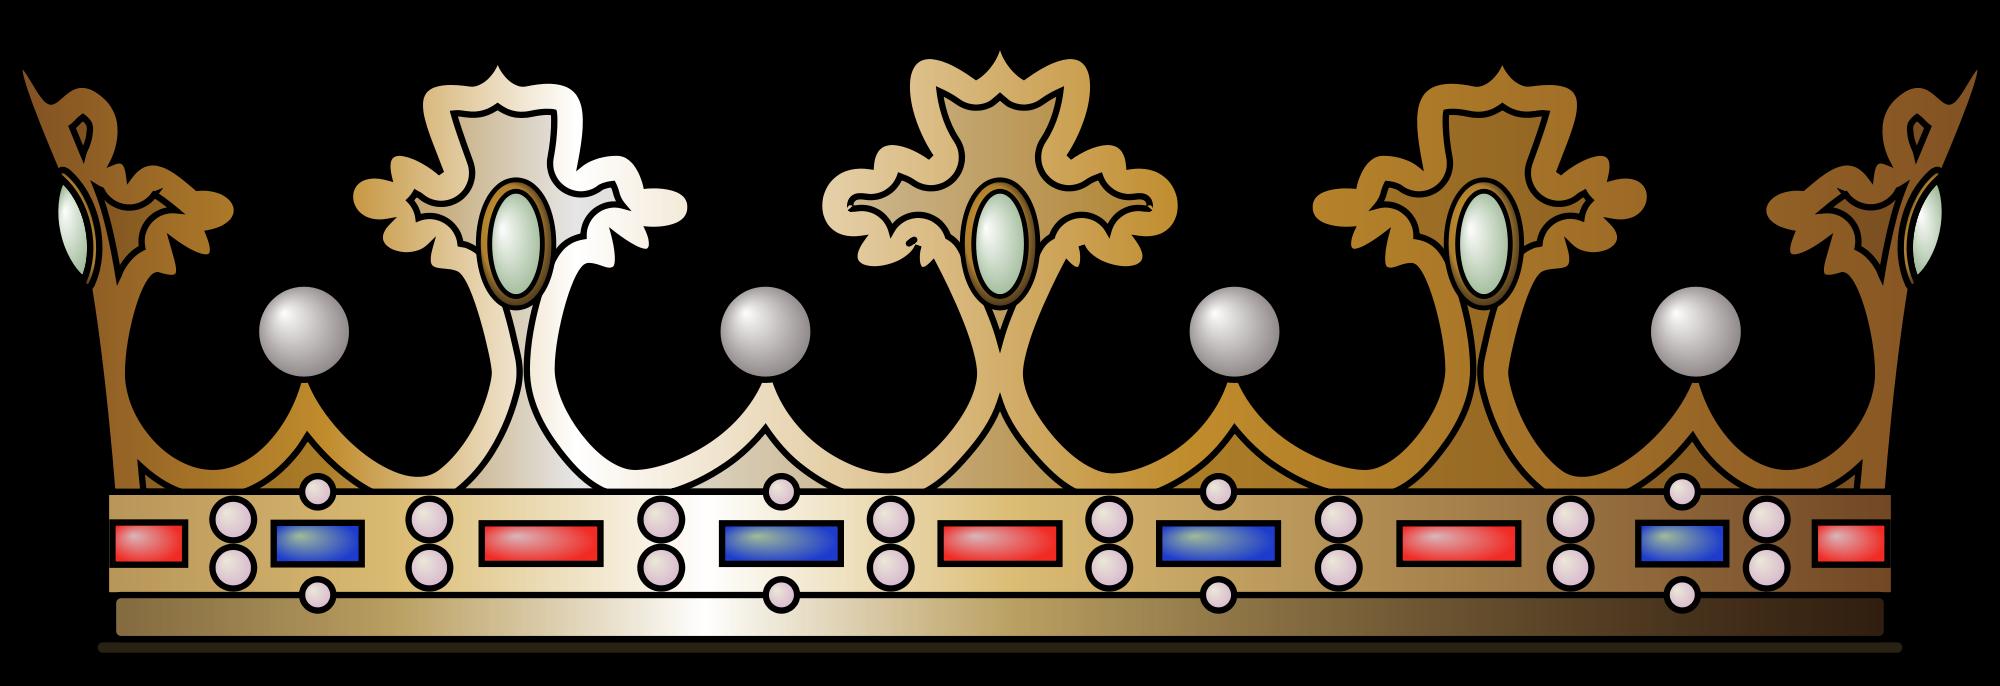 graphic free prince svg design #115168051